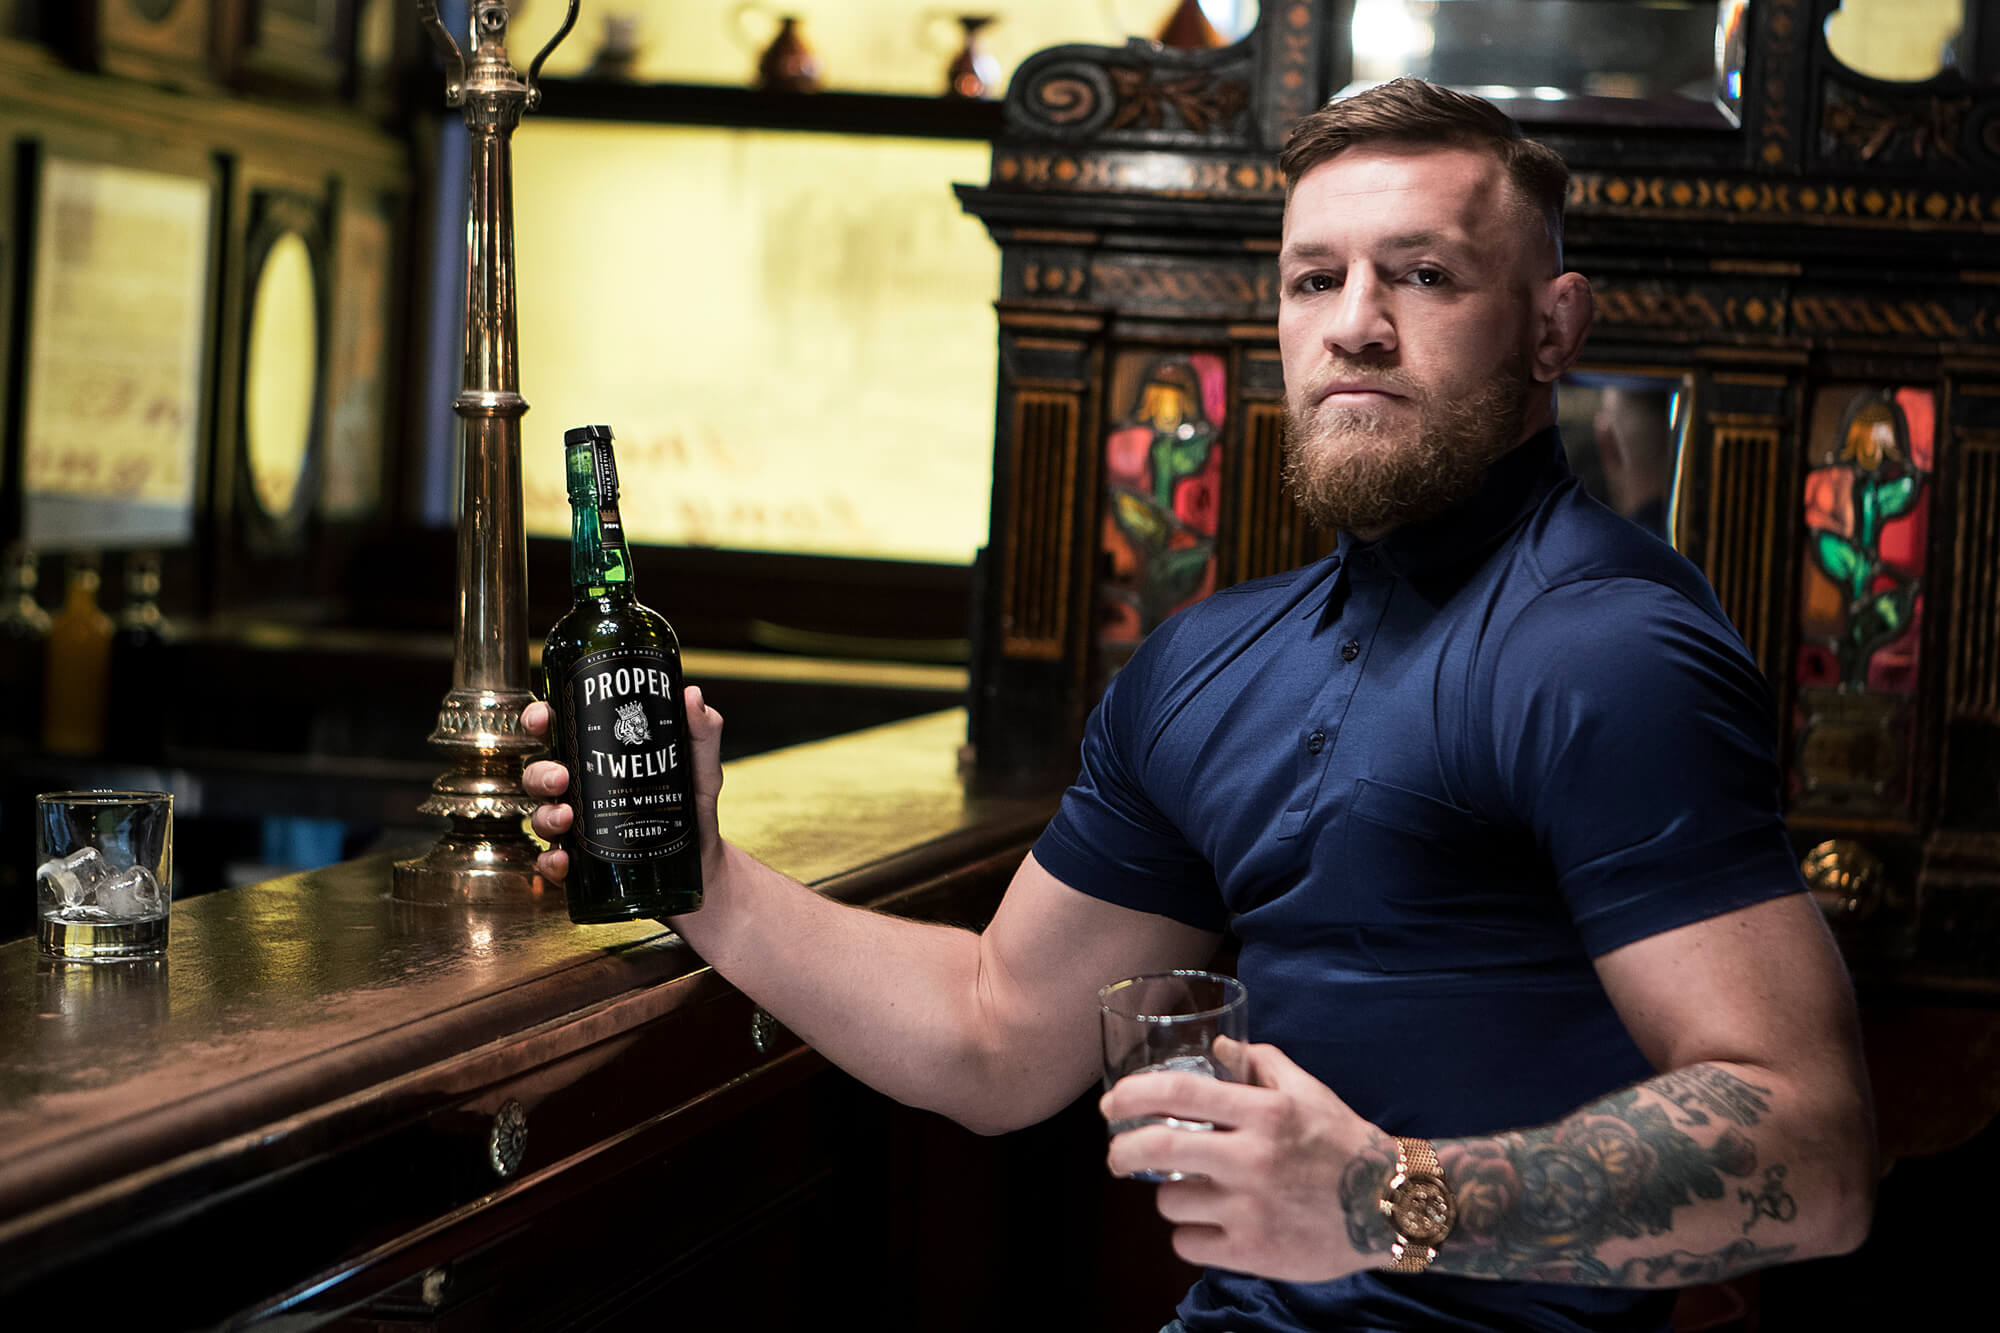 Conor McGregor Announces $1M Proper No. Twelve Donation to Tunnel to Towers Foundation | Nightclub & Bar Digital